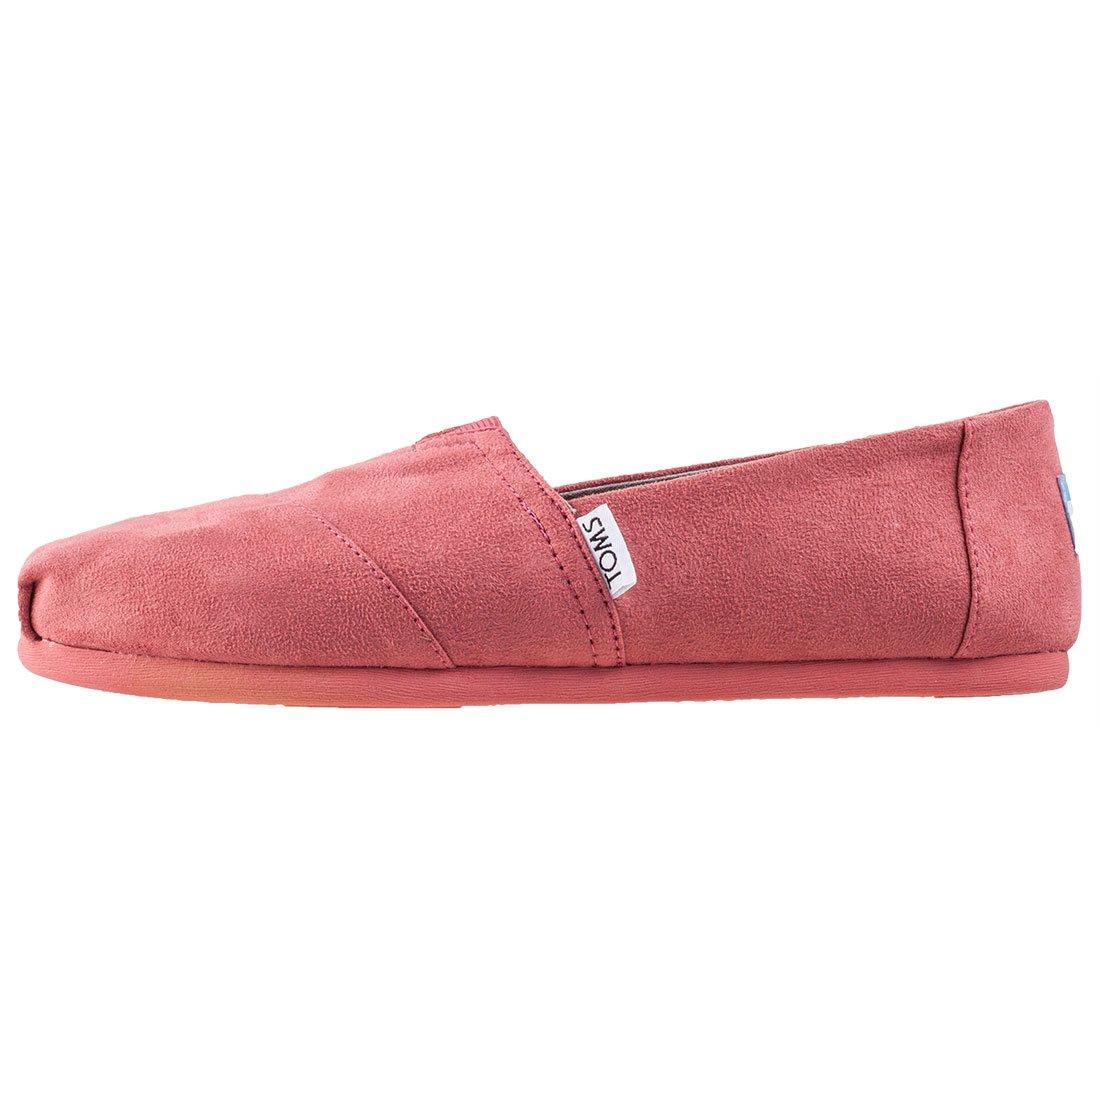 4e024af11a0 Amazon.com | TOMS Women's Lenox Sneakers Shoes | Fashion Sneakers